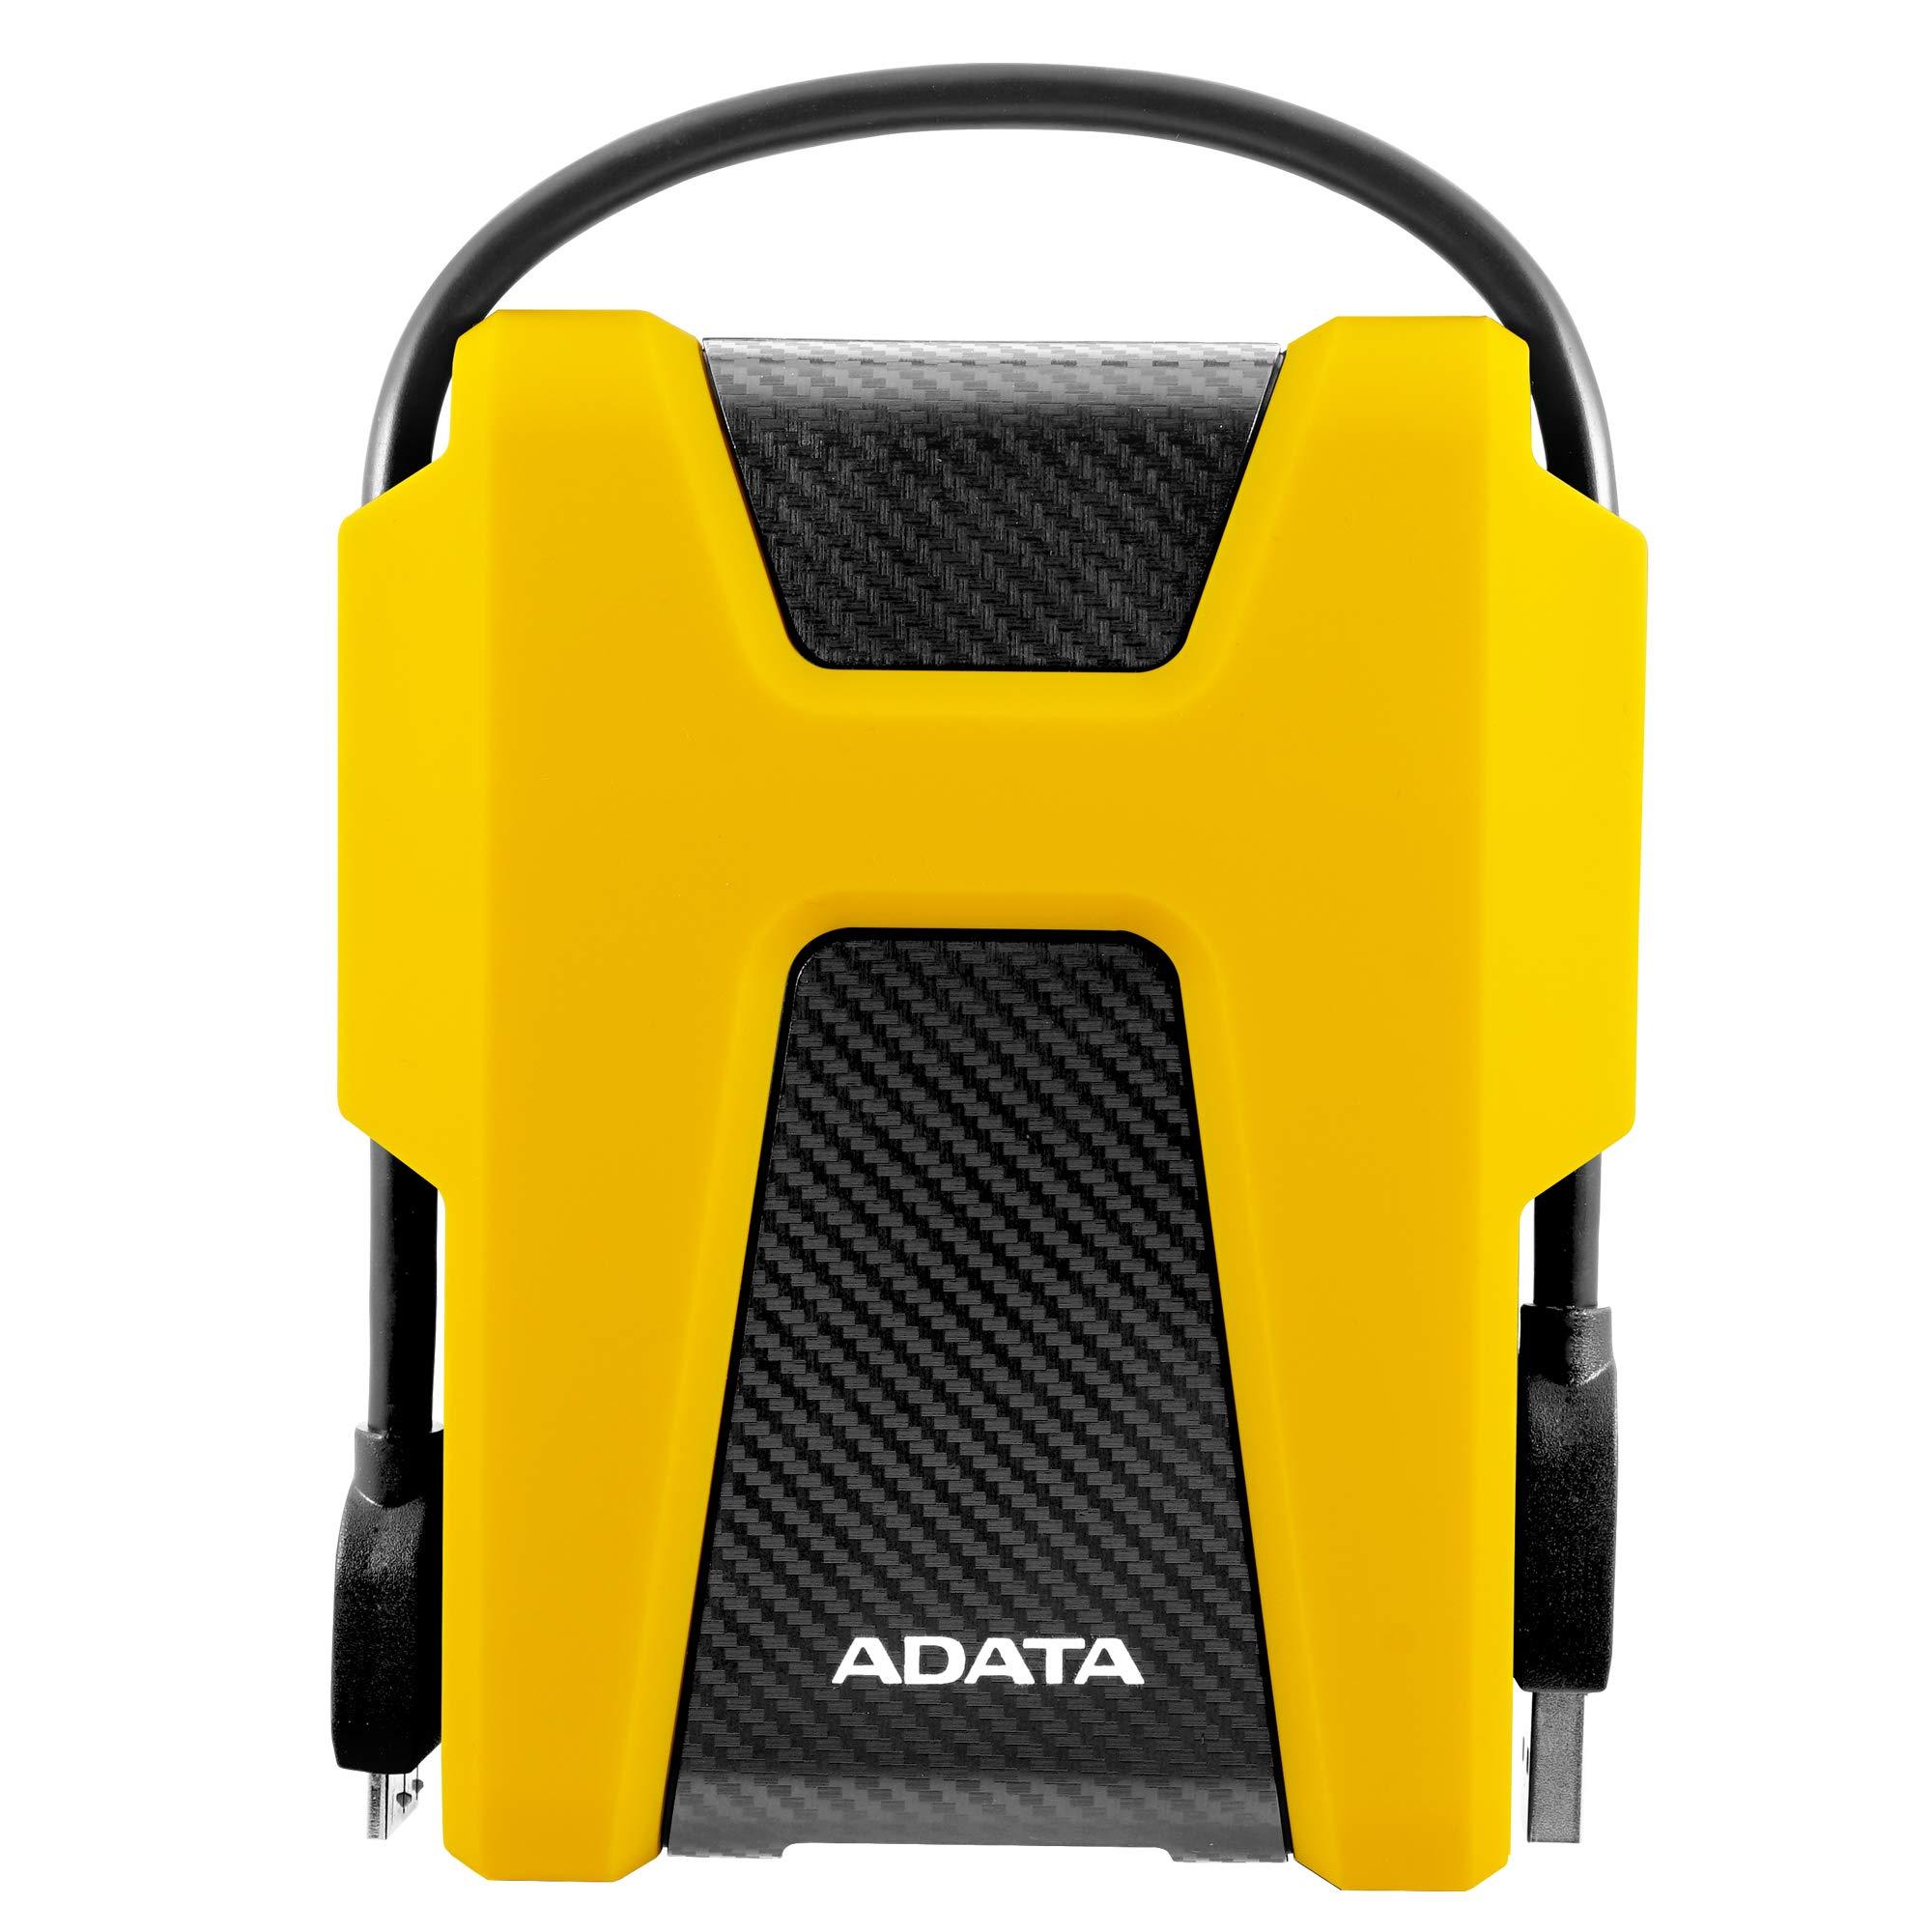 ADATA HD680 1TB Military-Grade Shock-Proof External Portable Hard Drive Yellow (AHD680-1TU31-CYL)